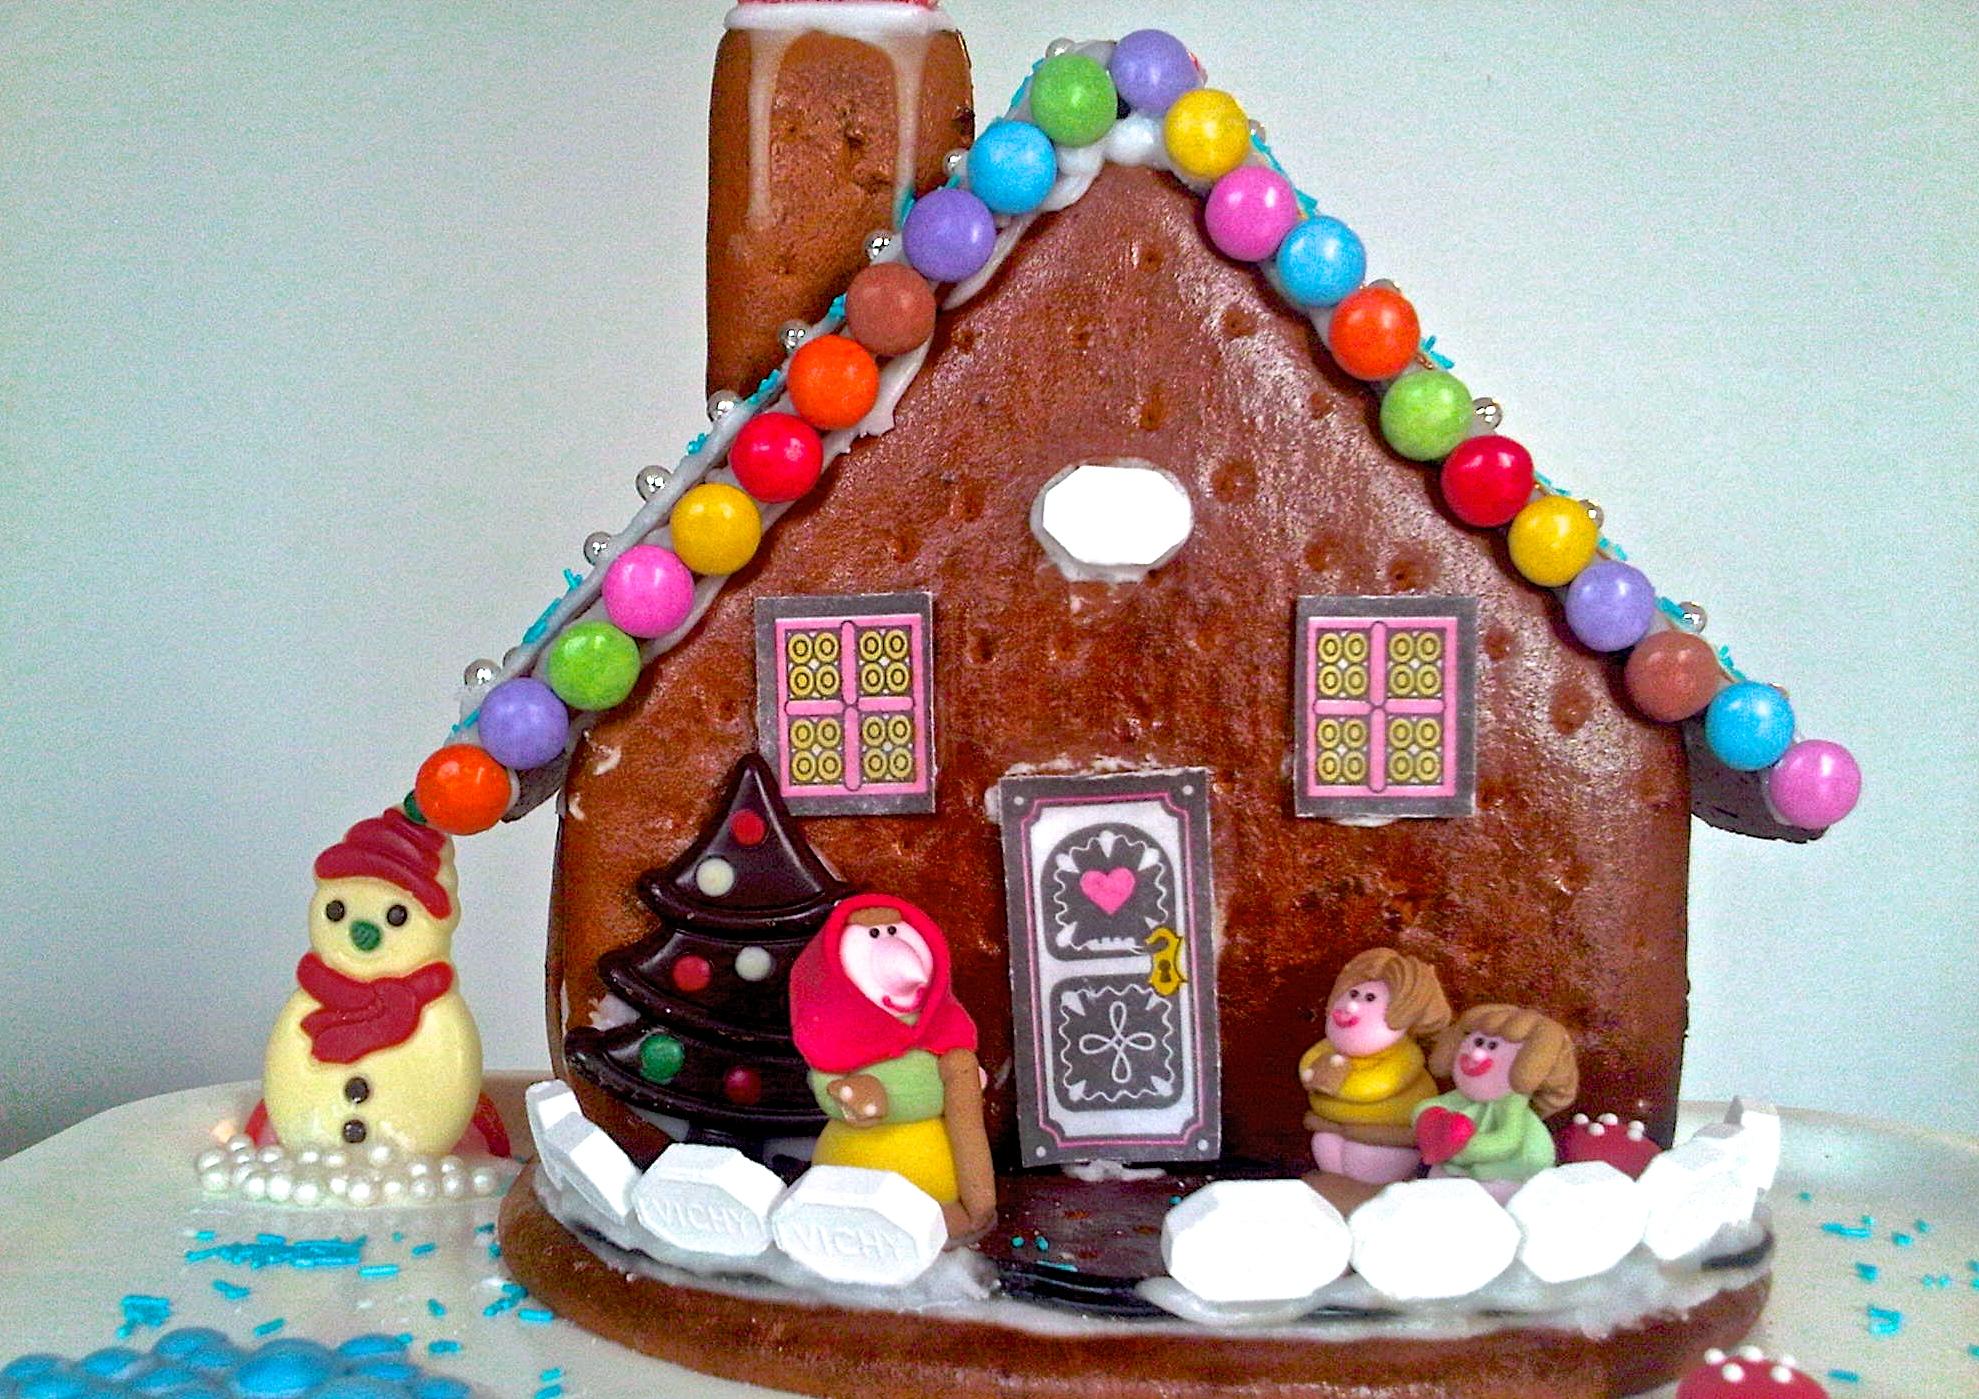 gingerbread house - Sweet Cabane